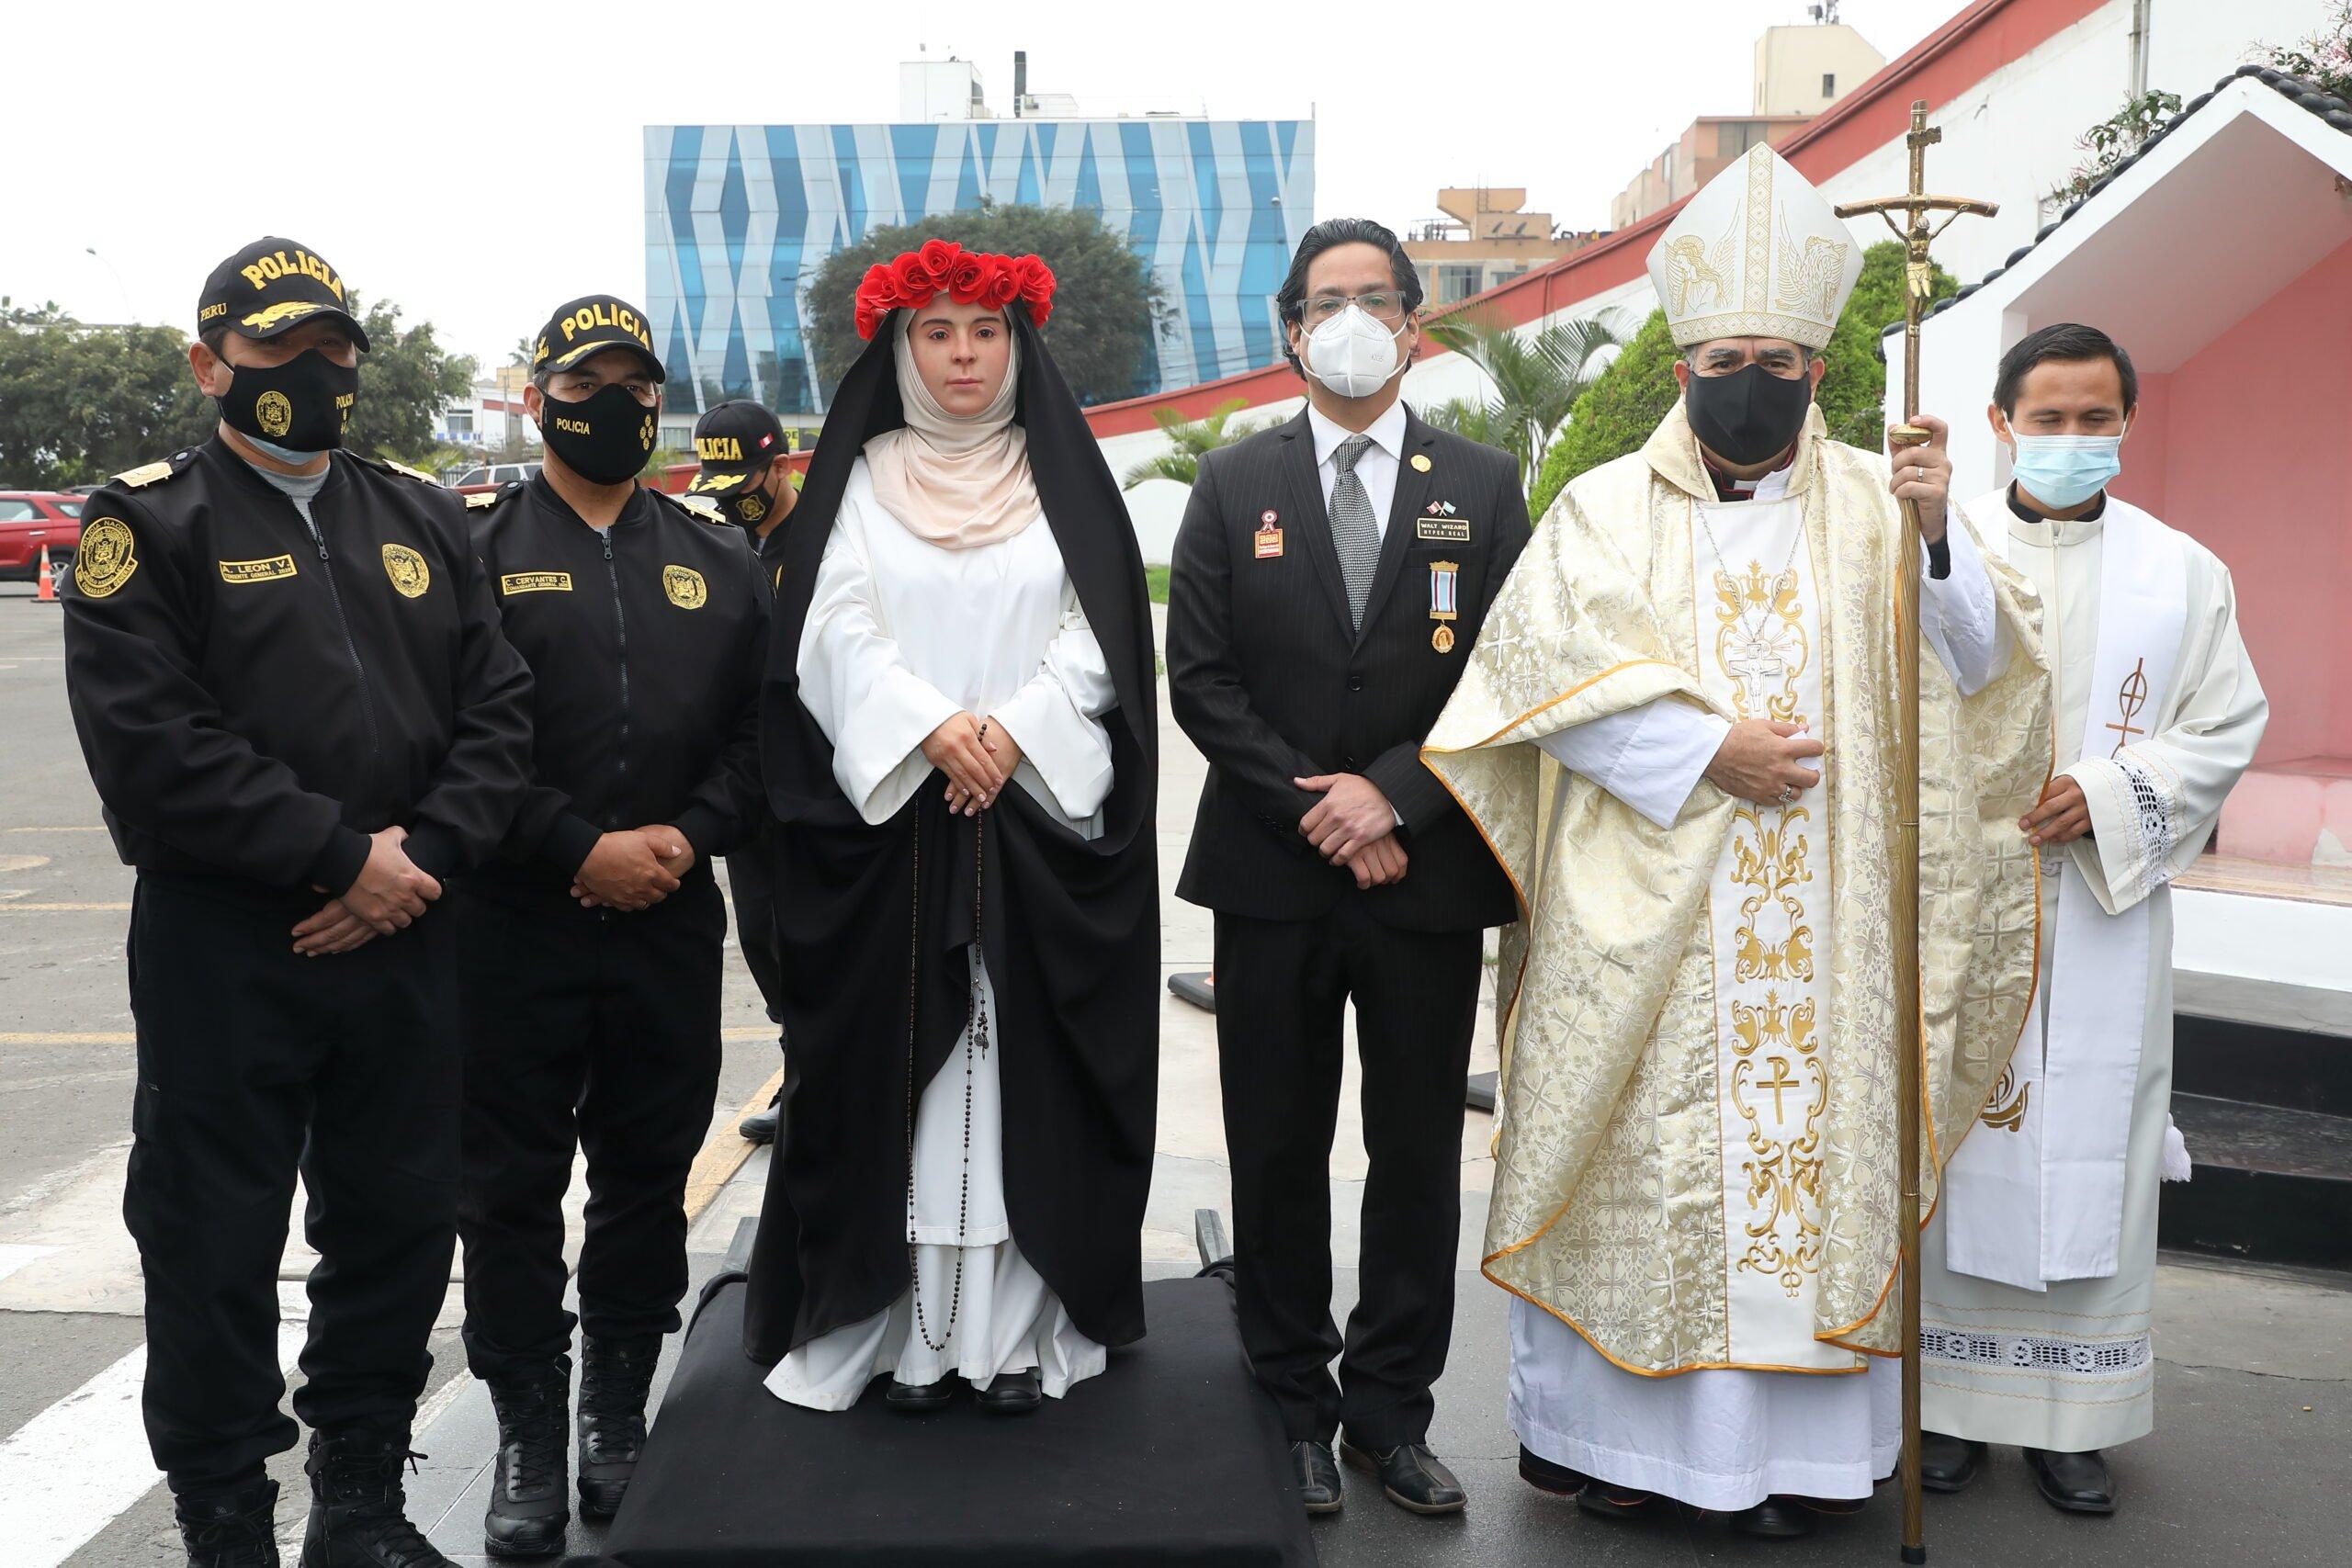 Santa Rosa de Lima: Presentan estatua hiperrealista a la Policía Nacional